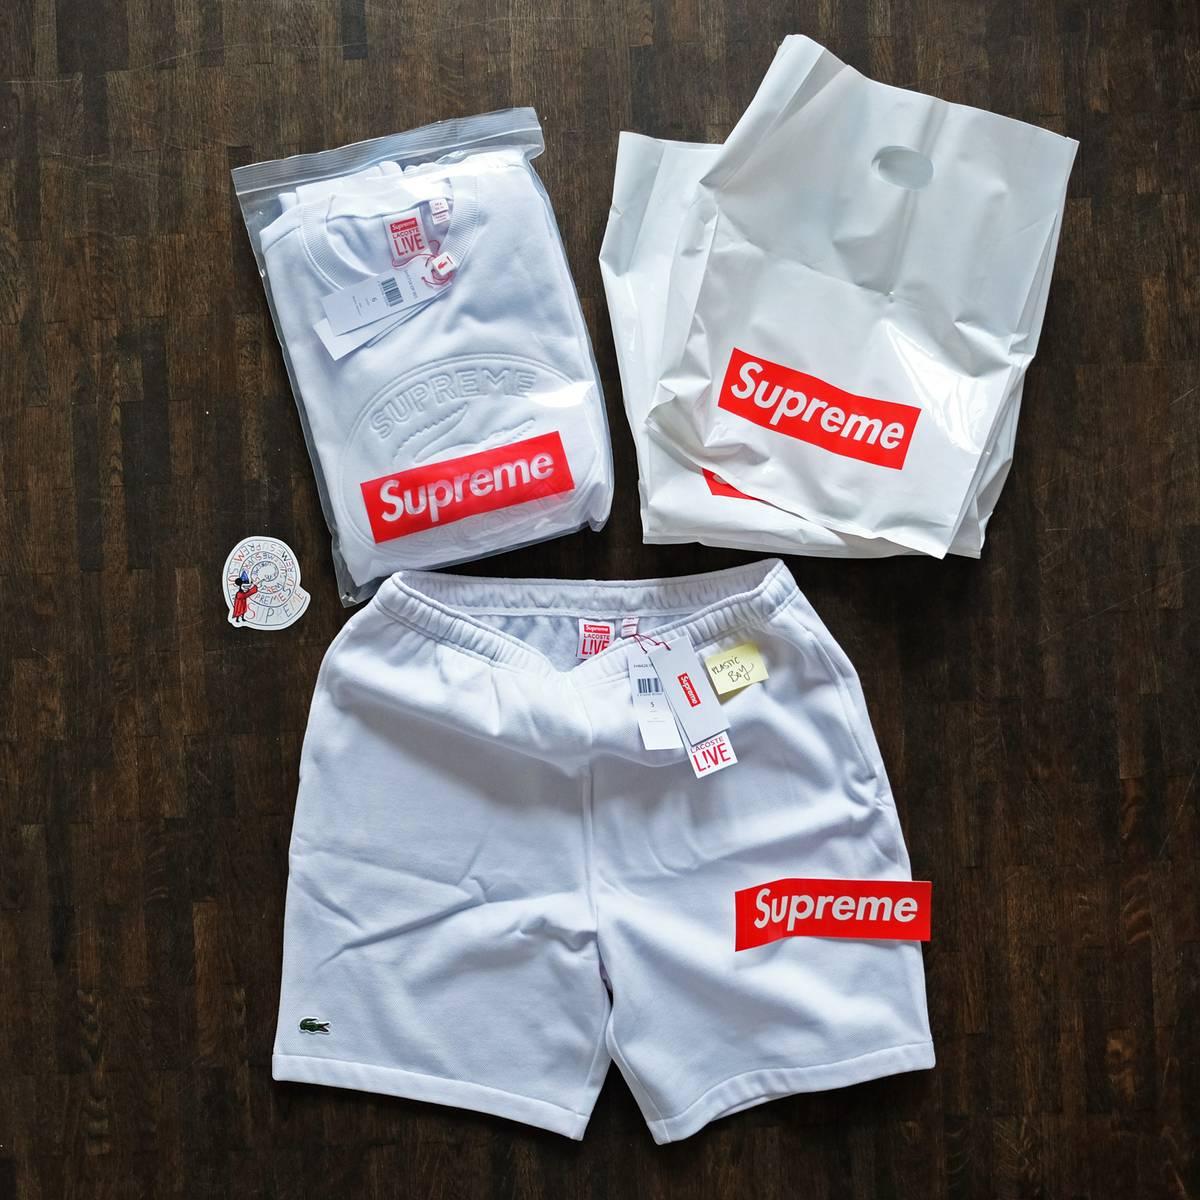 supreme shorts. supreme x lacoste pique short white l large shorts new photo 15